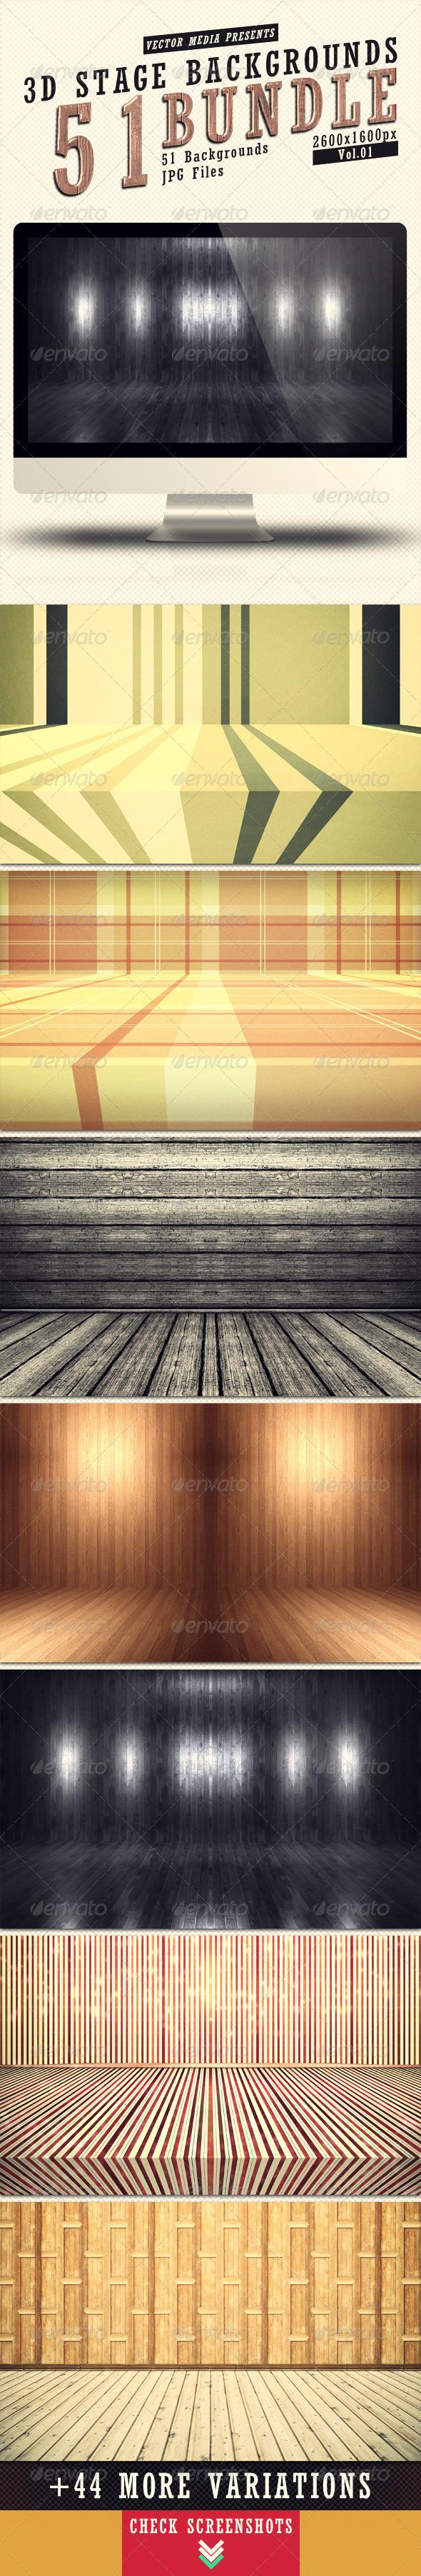 GraphicRiver 3D Stage Backgrounds Bundle Vol.1 4391033